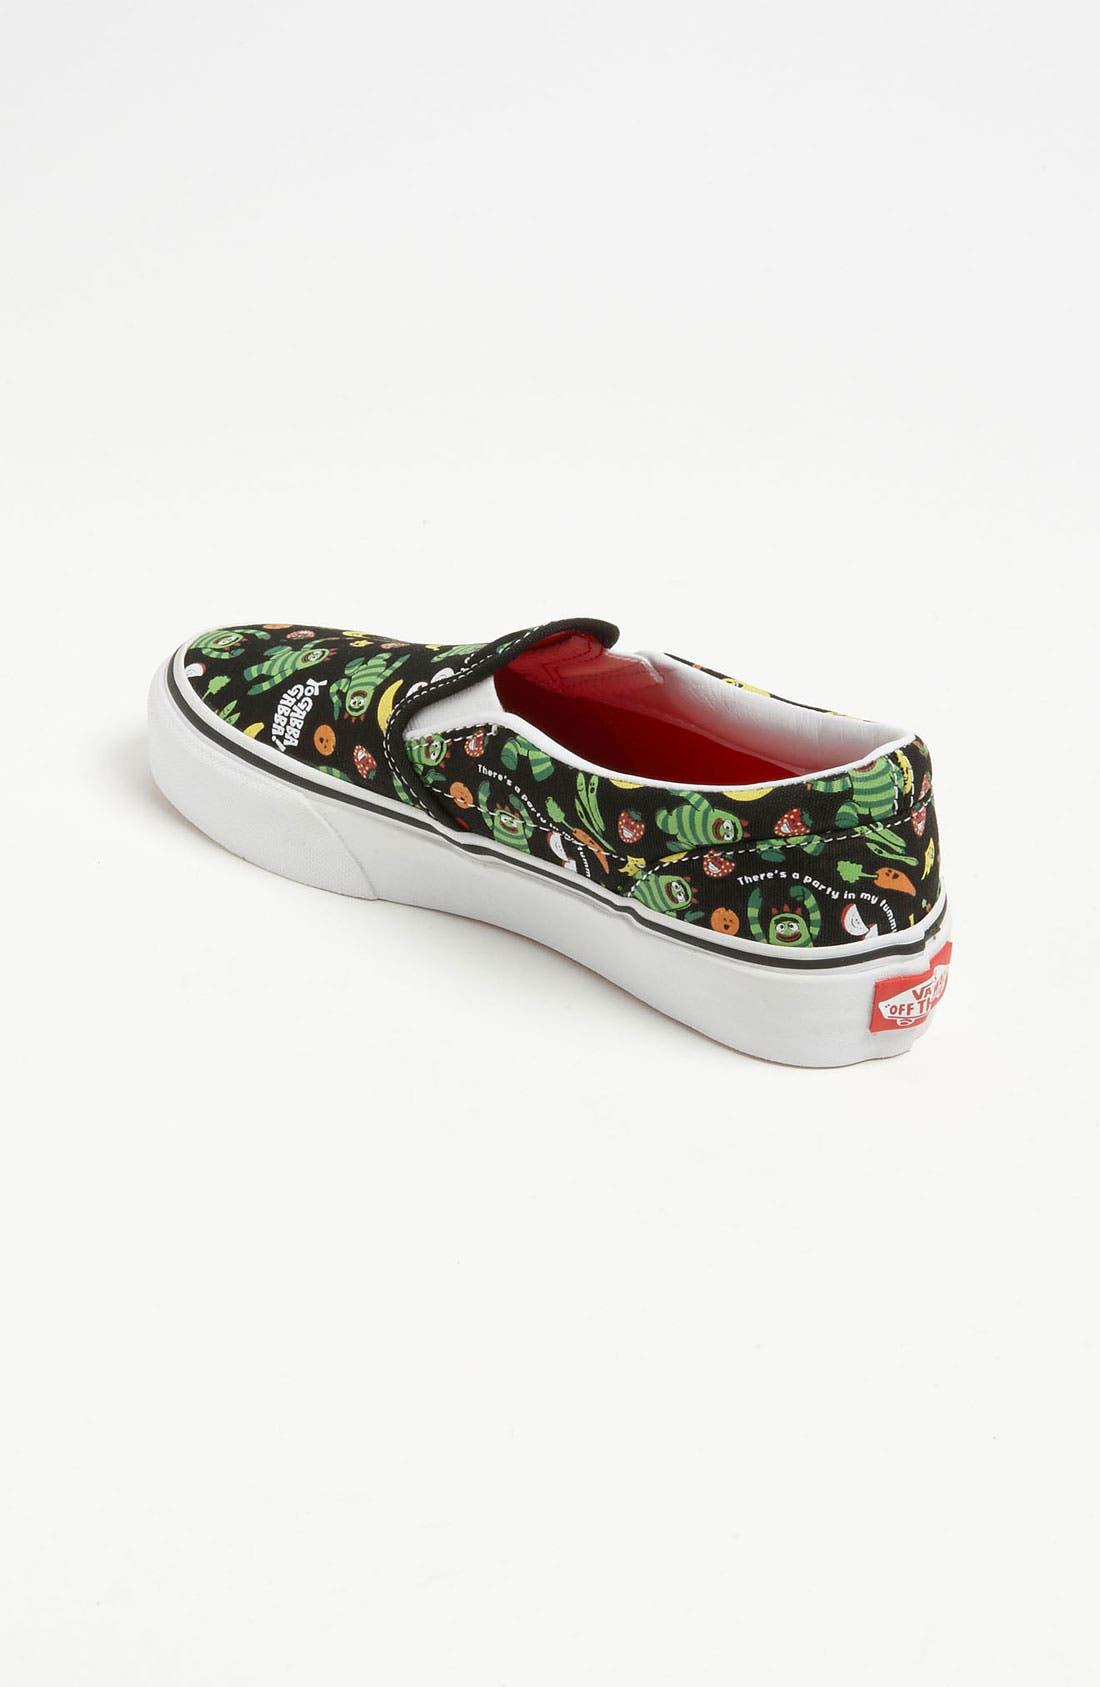 Alternate Image 2  - Vans 'Classic - Yo Gabba Gabba!™' Slip-On Sneaker (Toddler, Little Kid & Big Kid)